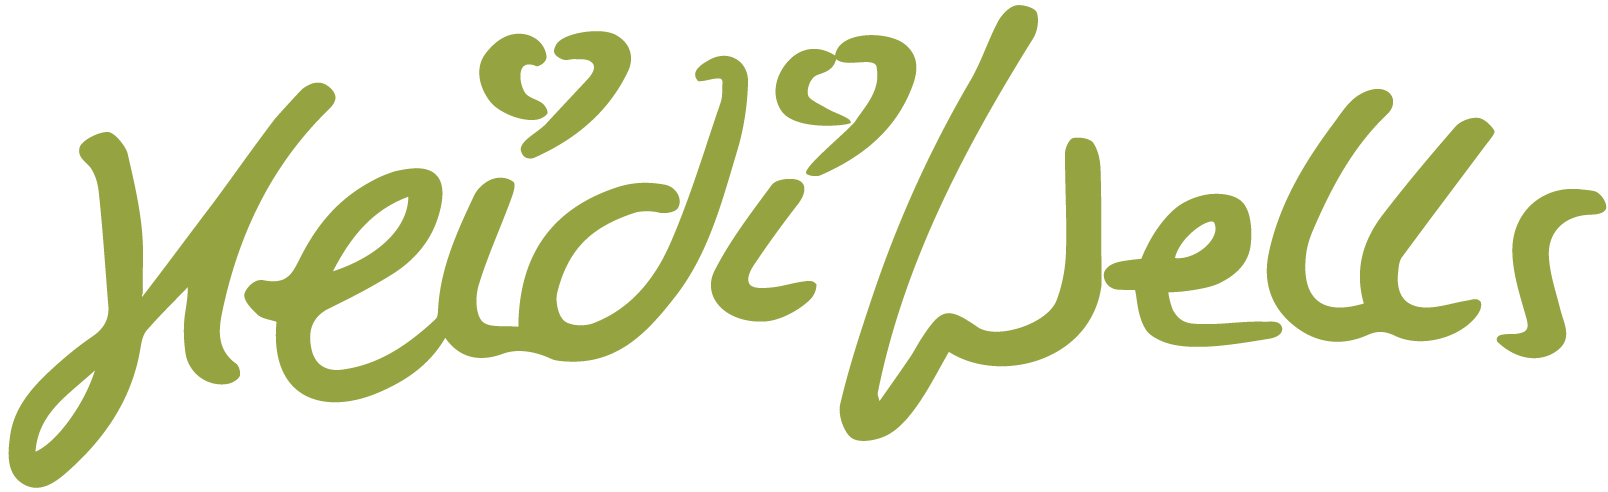 heidiwells.com